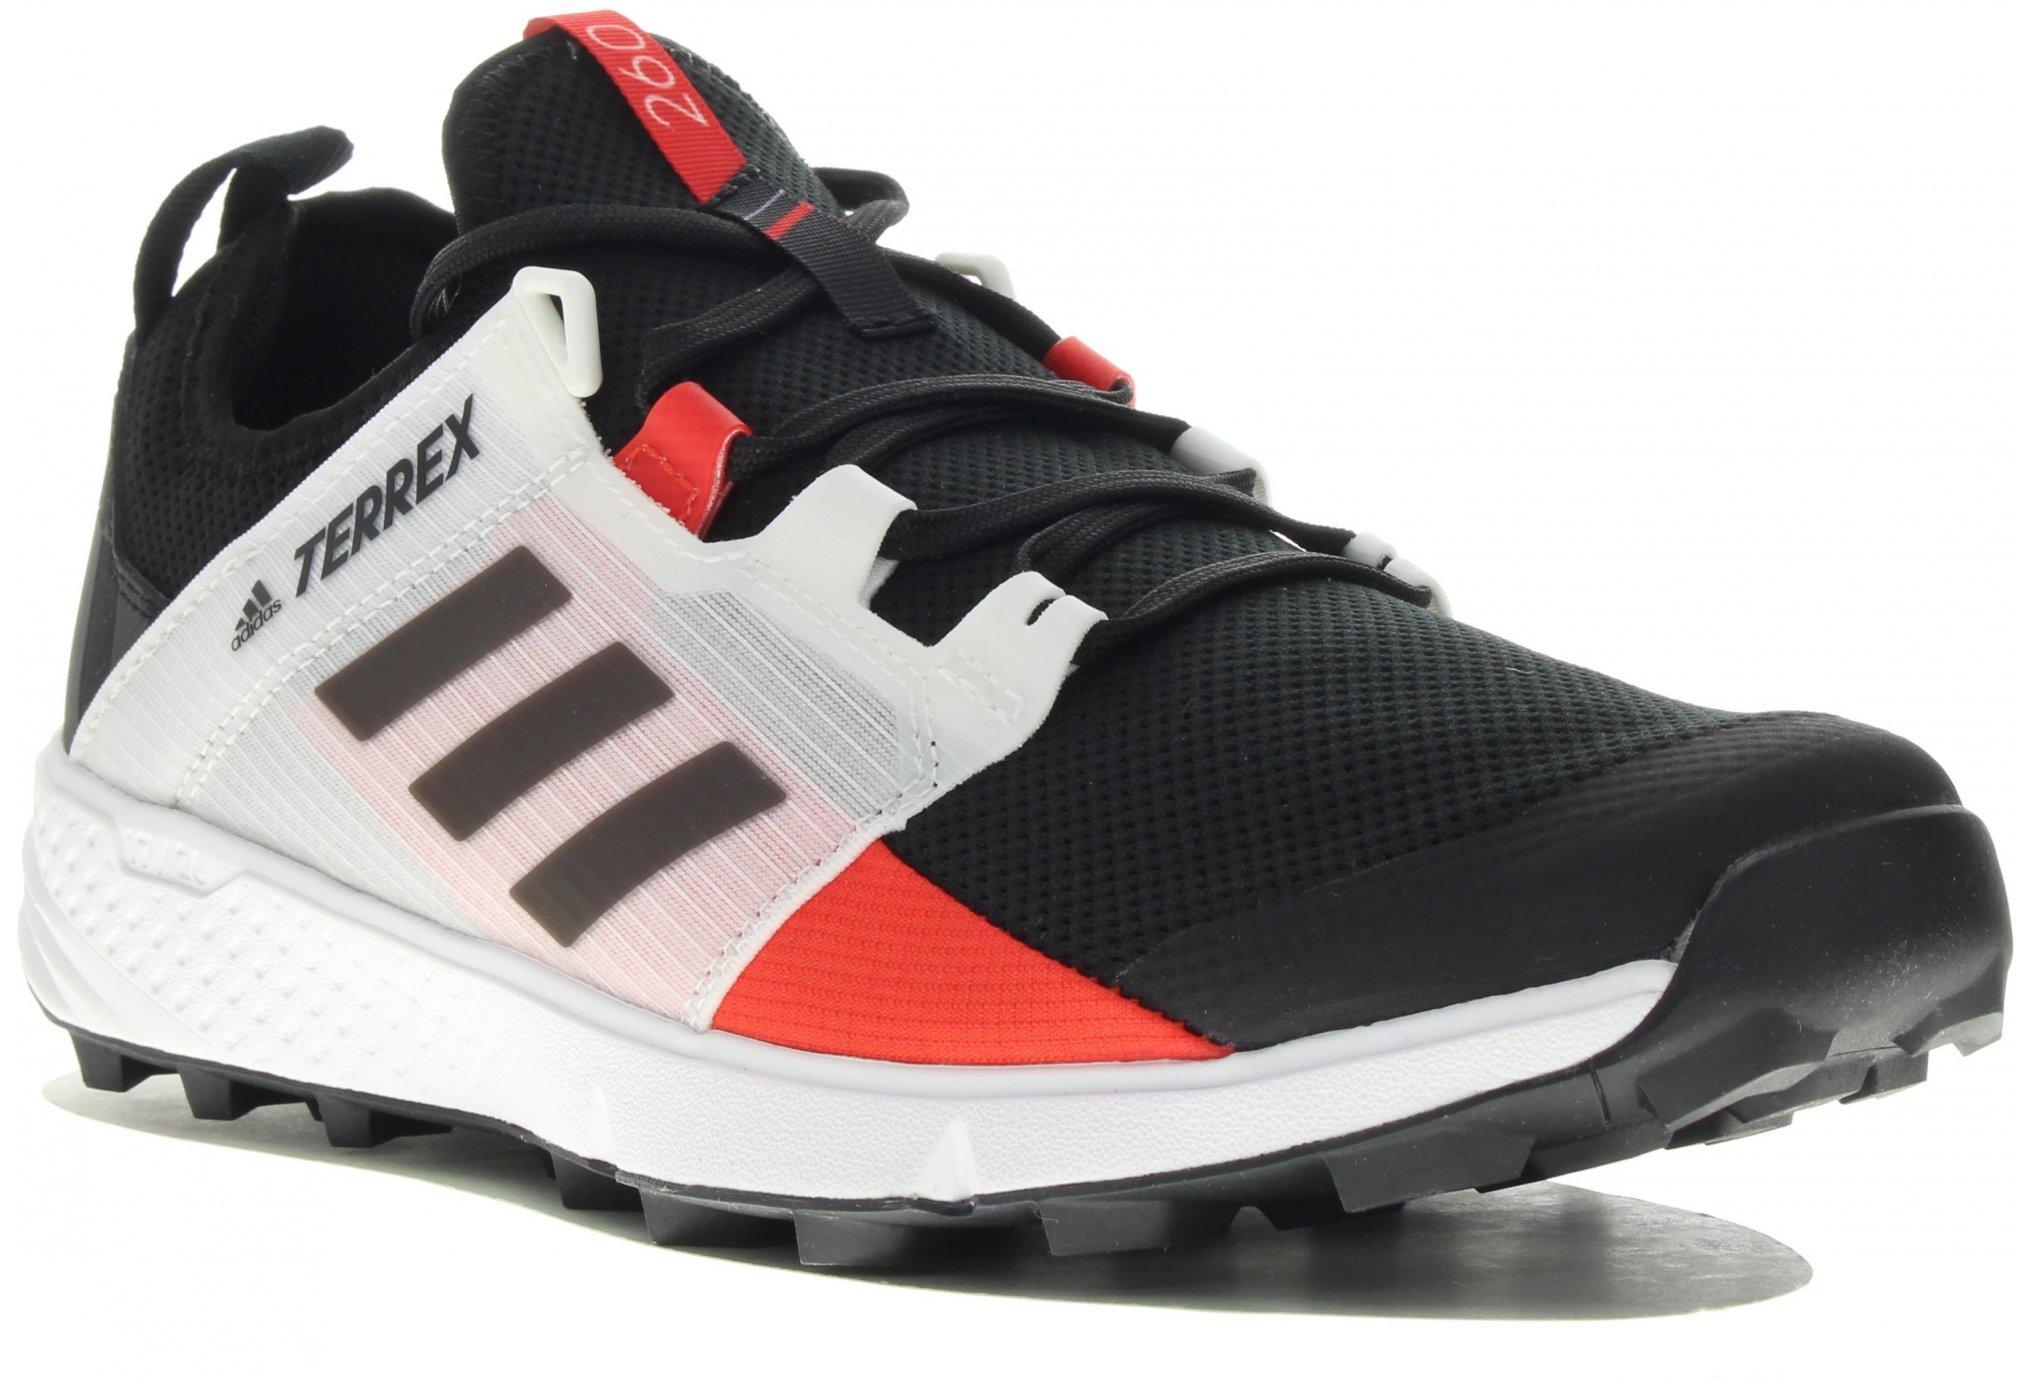 adidas Terrex Speed LD M Chaussures homme